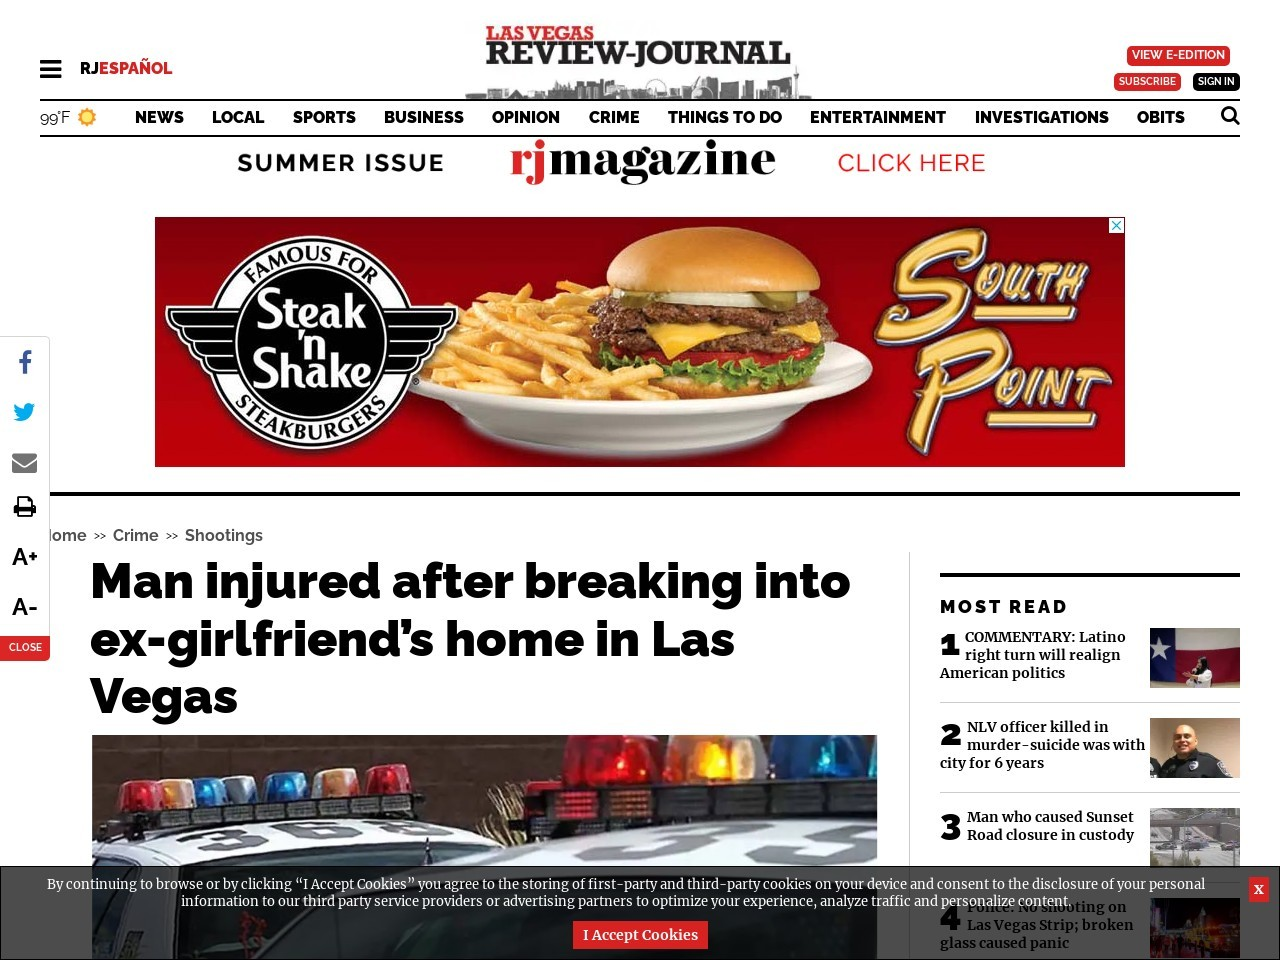 Man injured after breaking into ex-girlfriend's home in Las Vegas